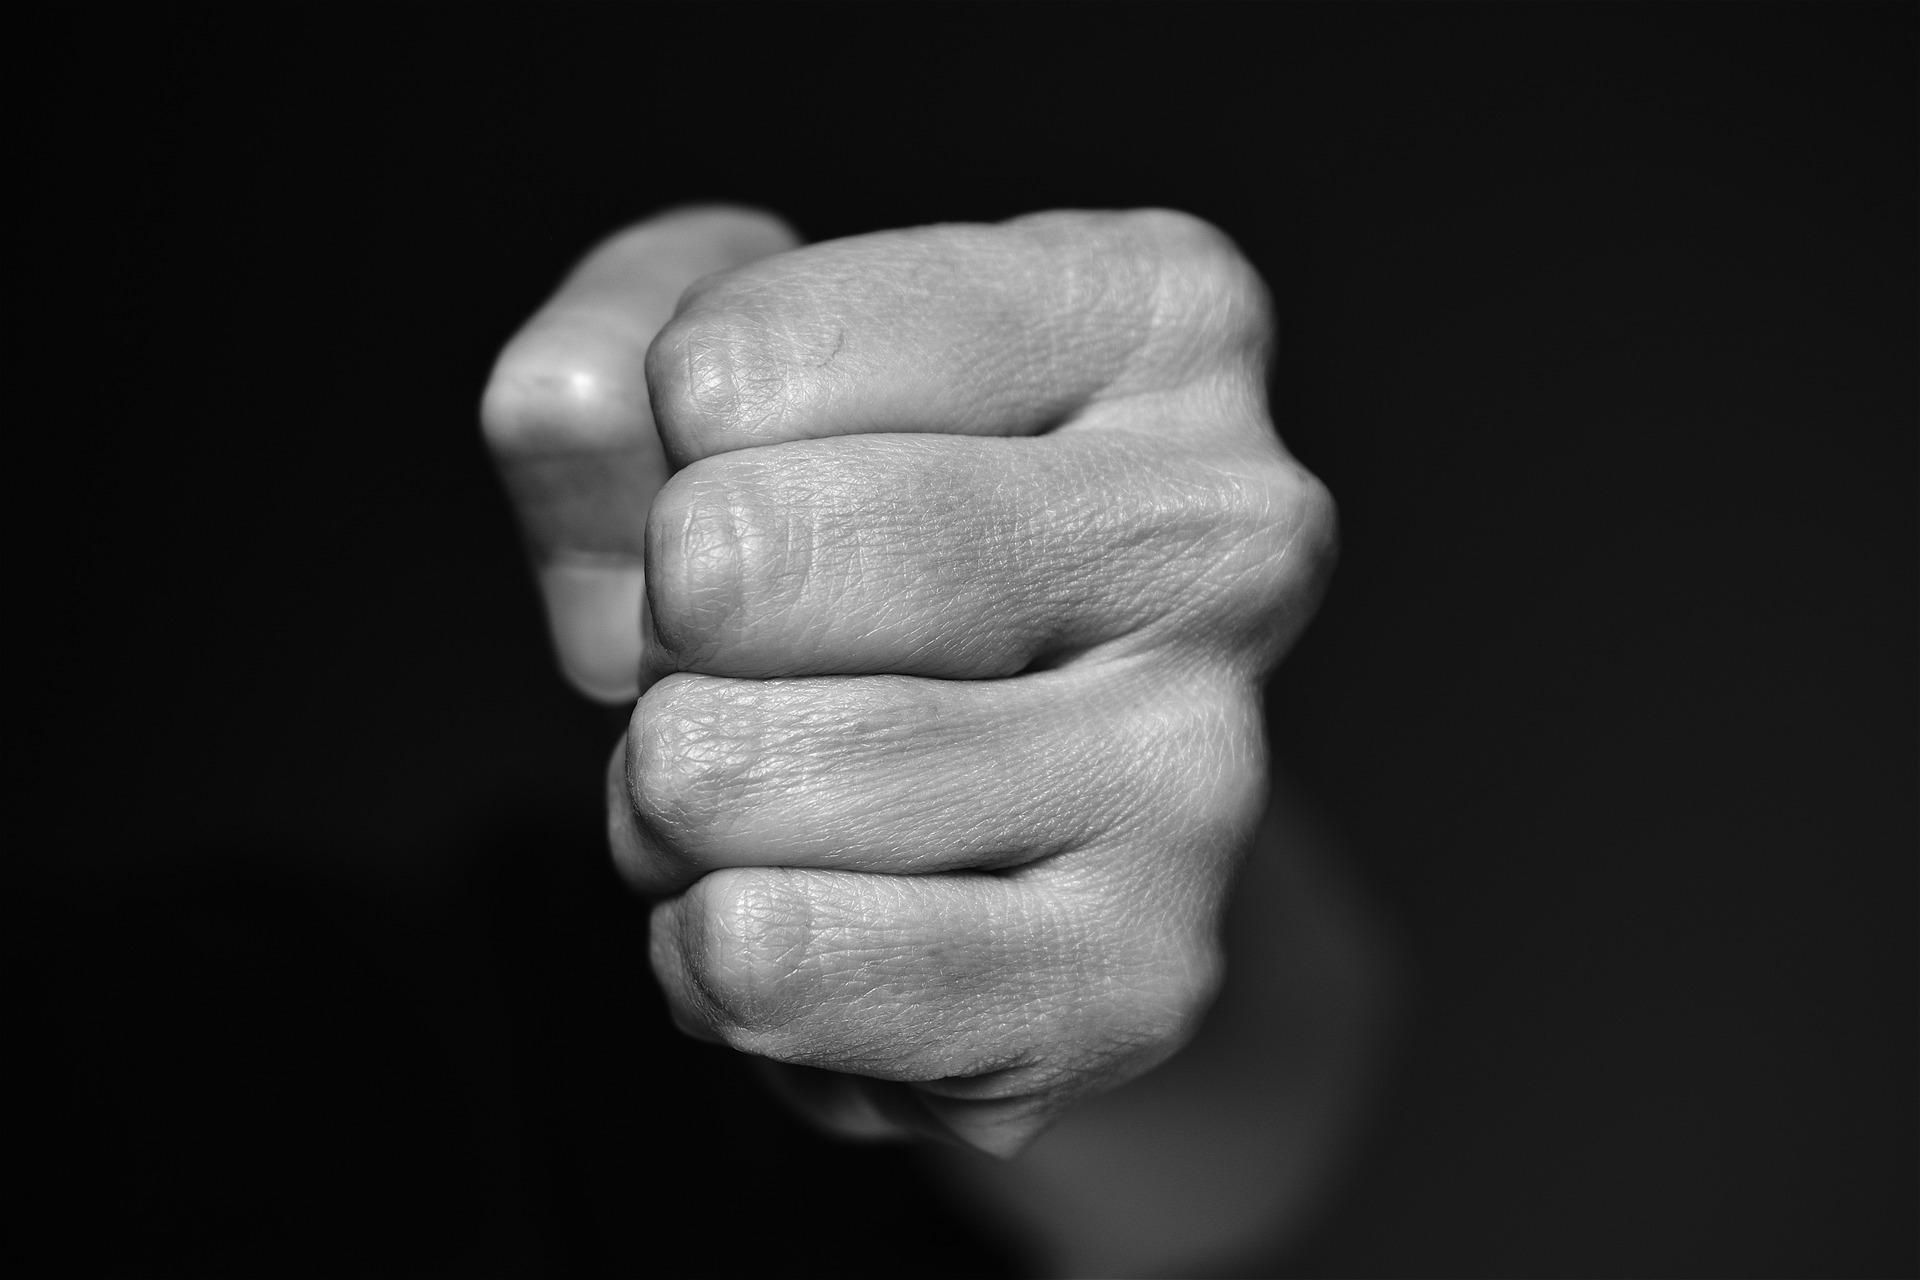 fist-4117726_1920